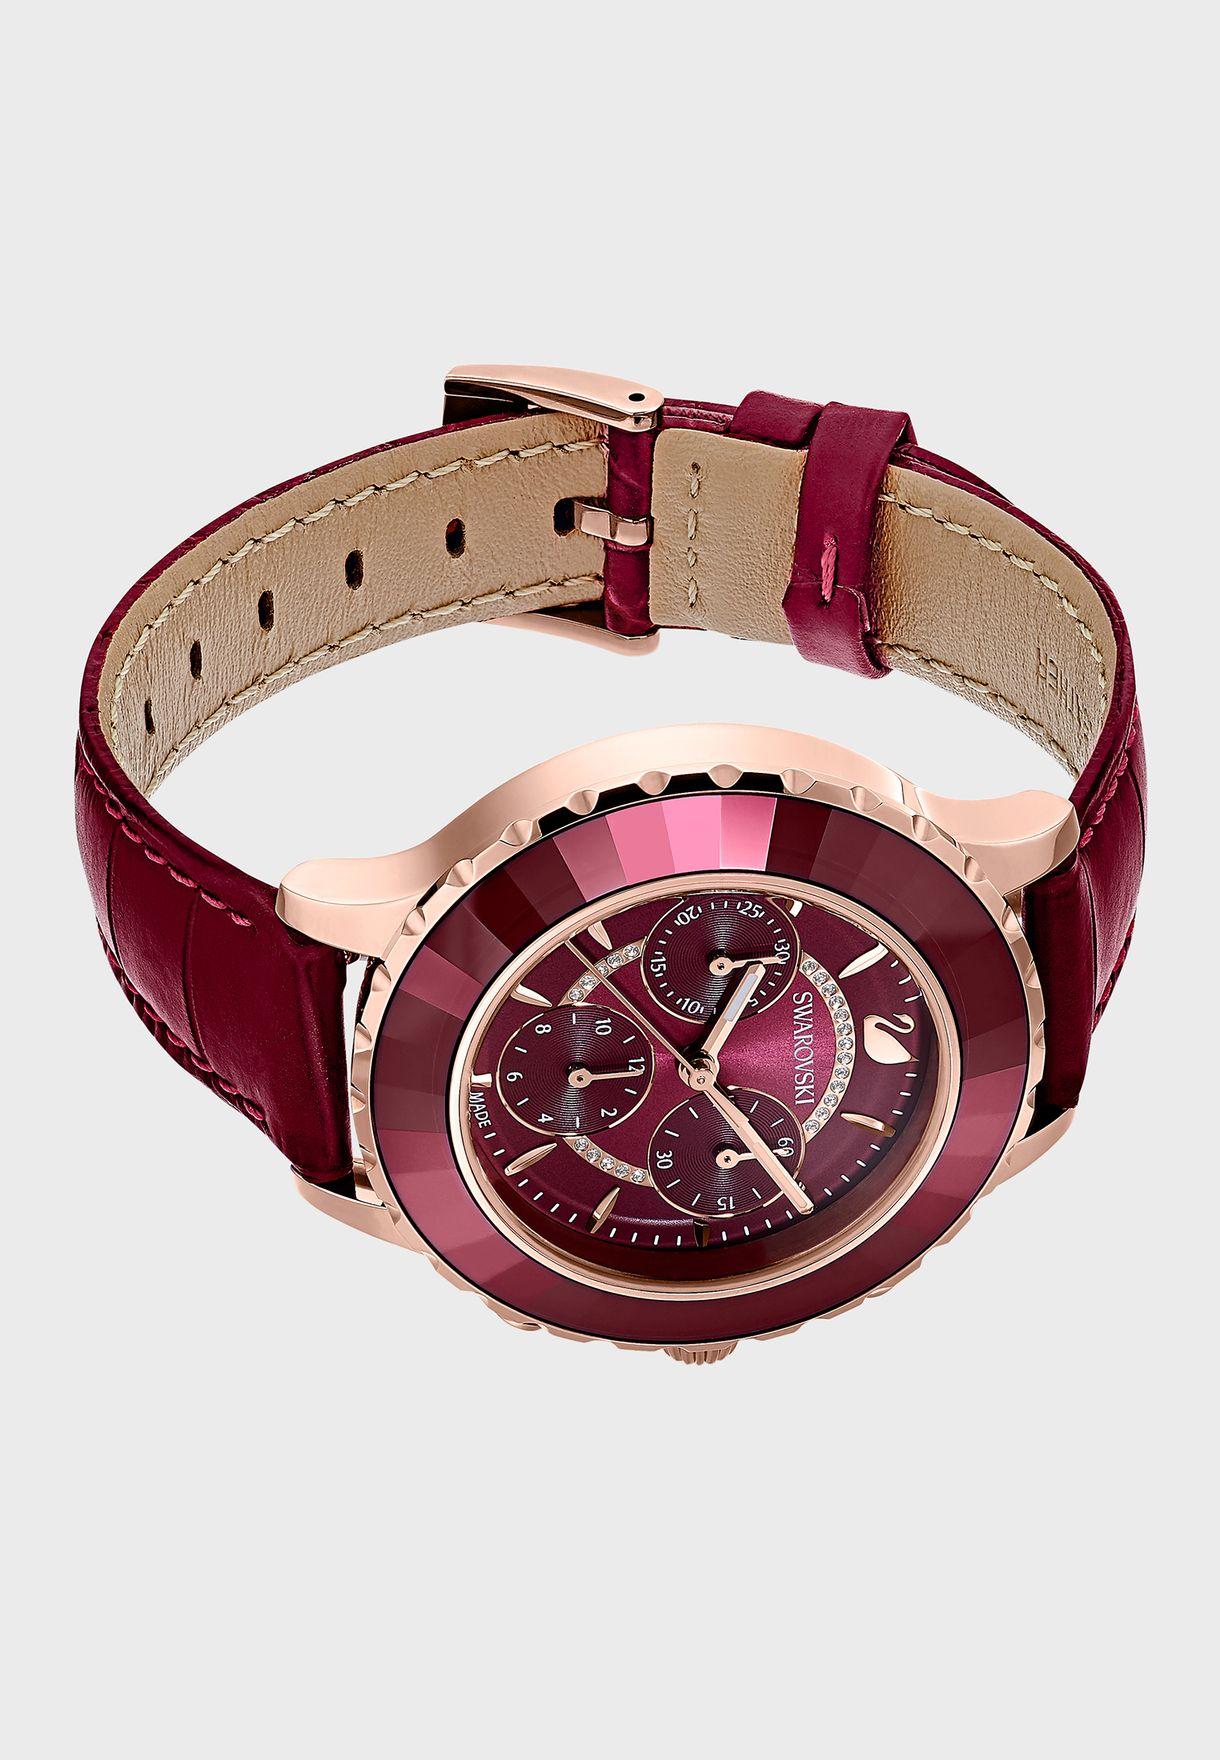 Octea Lux Chrono Analog Watch